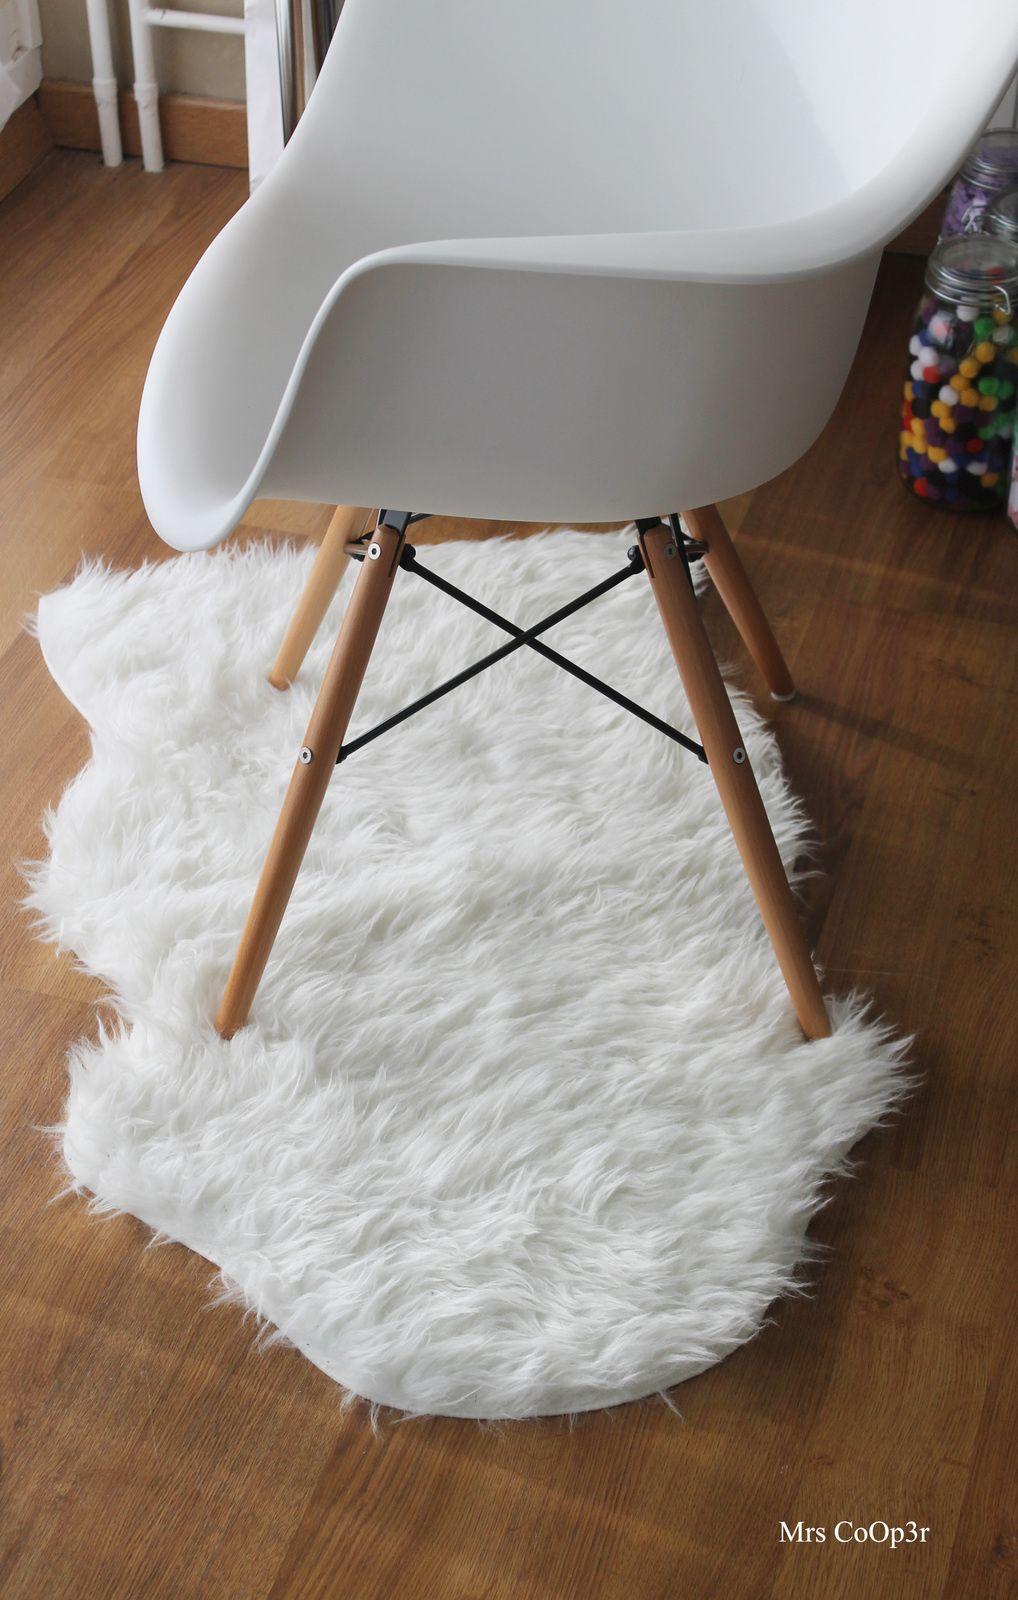 tapis imitation peau de mouton ikea d co furniture. Black Bedroom Furniture Sets. Home Design Ideas